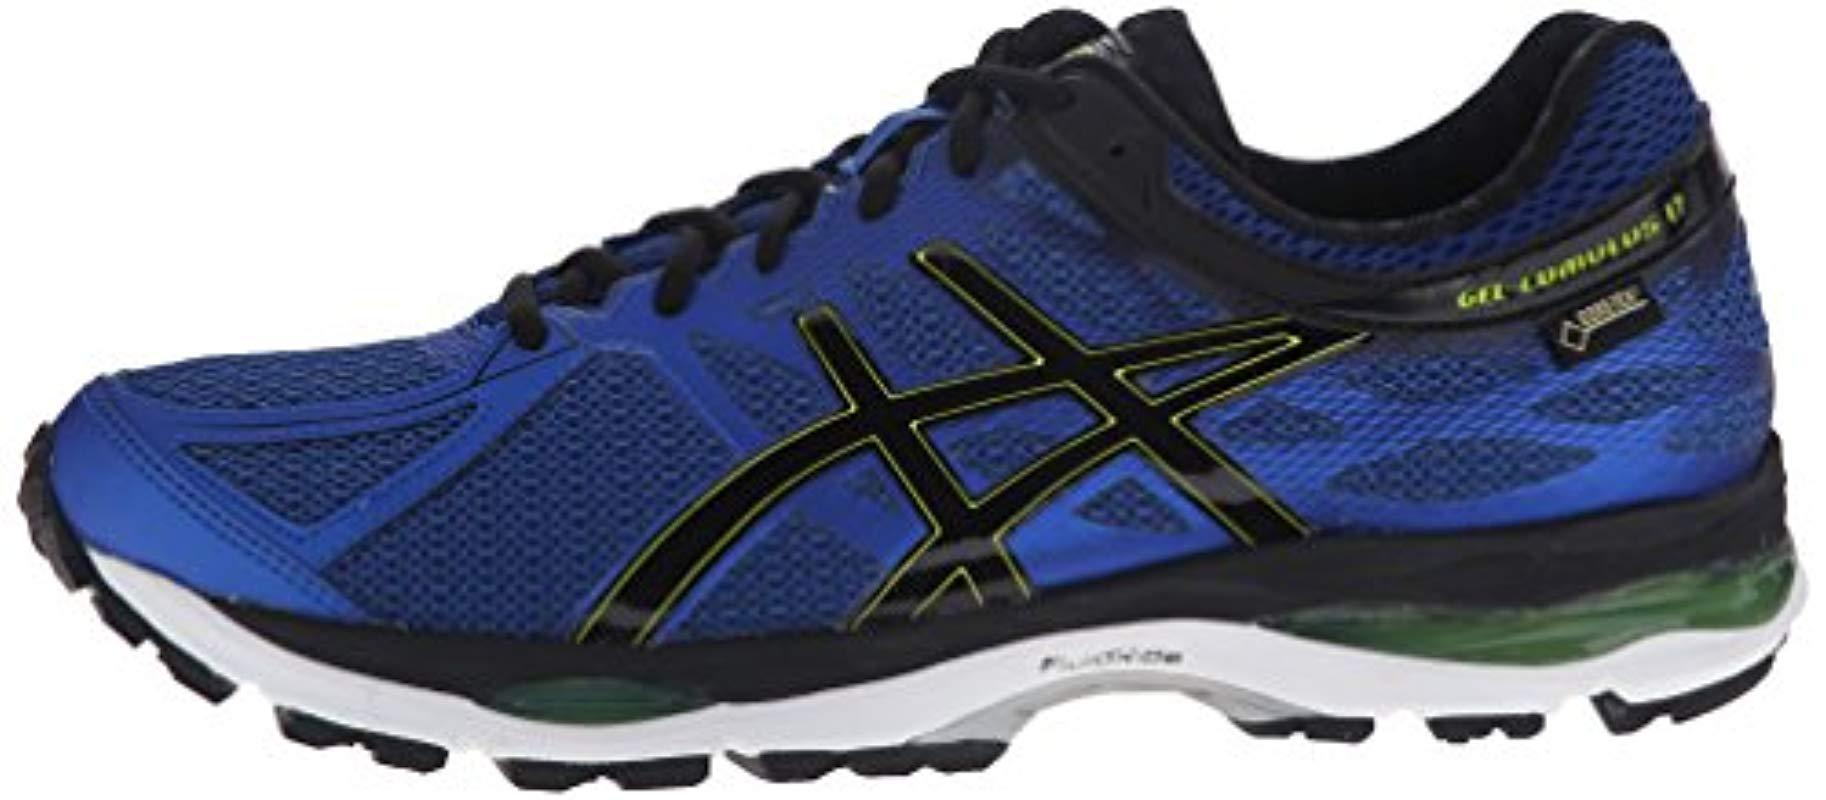 Gel-cumulus 17 G Tx Running Shoe